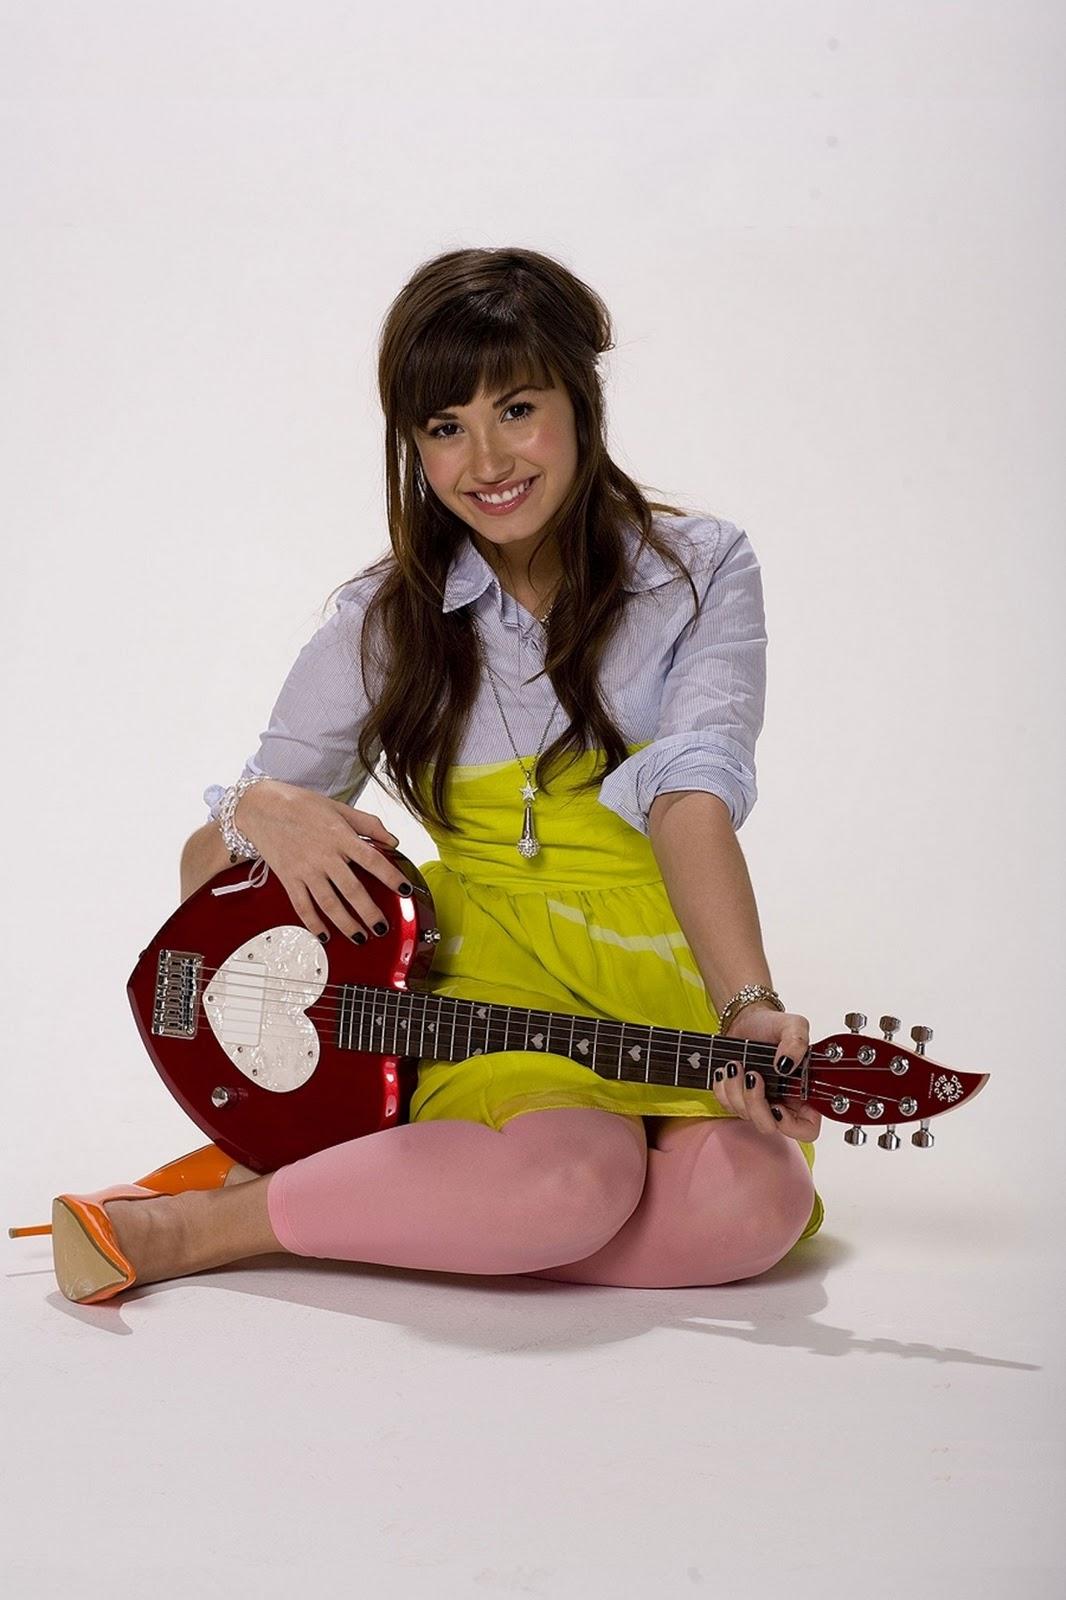 http://3.bp.blogspot.com/-RpoxqA2stjQ/TpXMdpdPoVI/AAAAAAAABao/gi2Y0o7cFEU/s1600/Demi+Lovato016903062.jpg